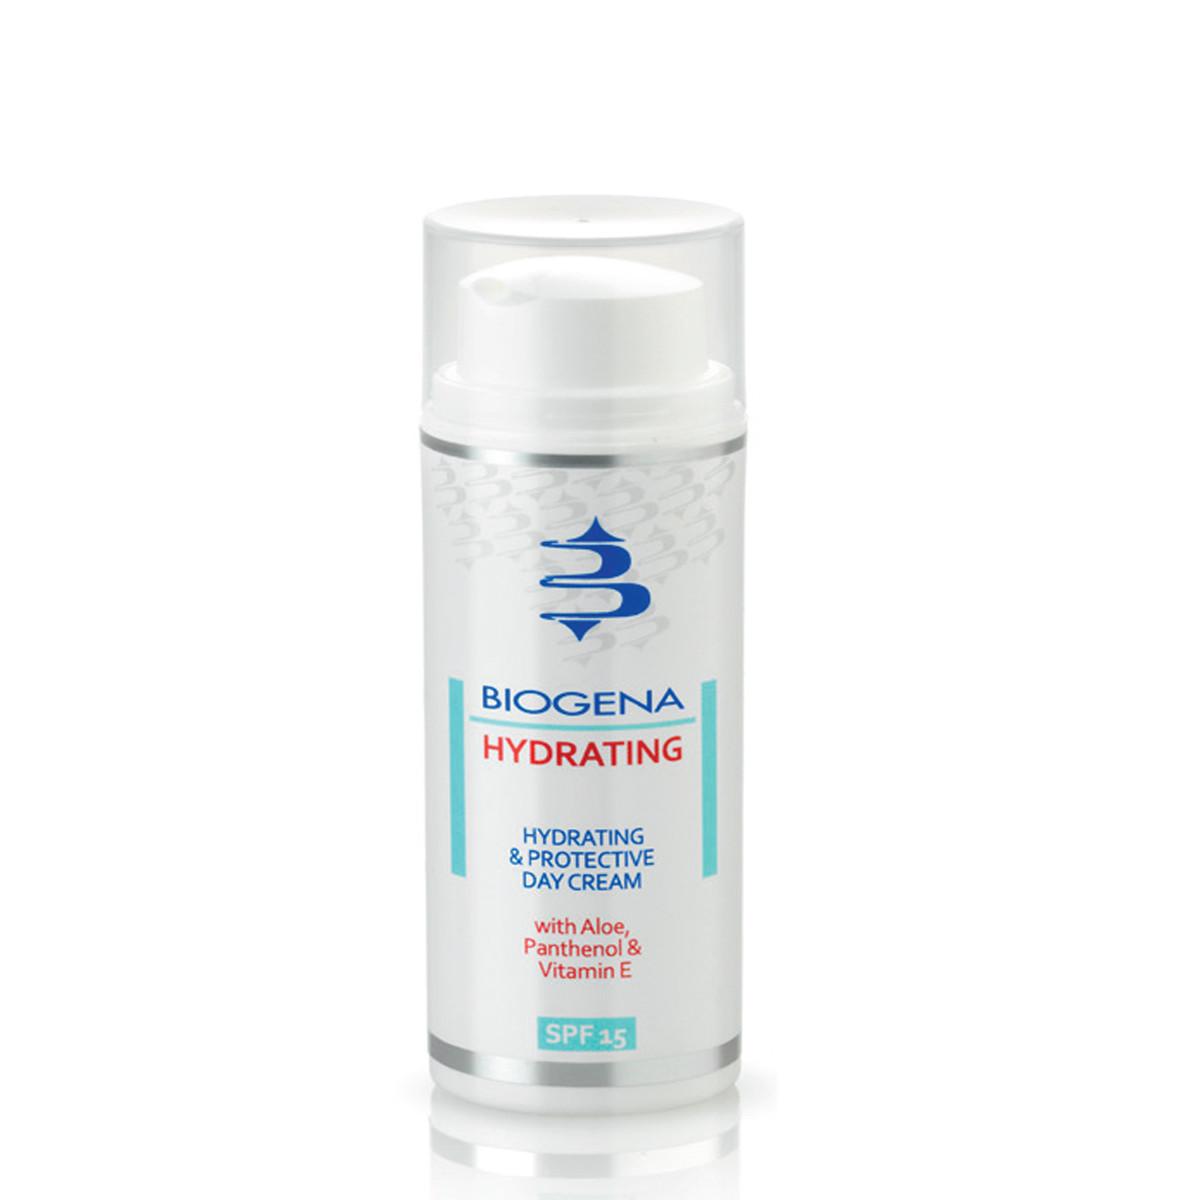 Biogena Hydrating and Protective Day Cream SPF 15 - Денний зволожуючий і захисний крем з SPF-15